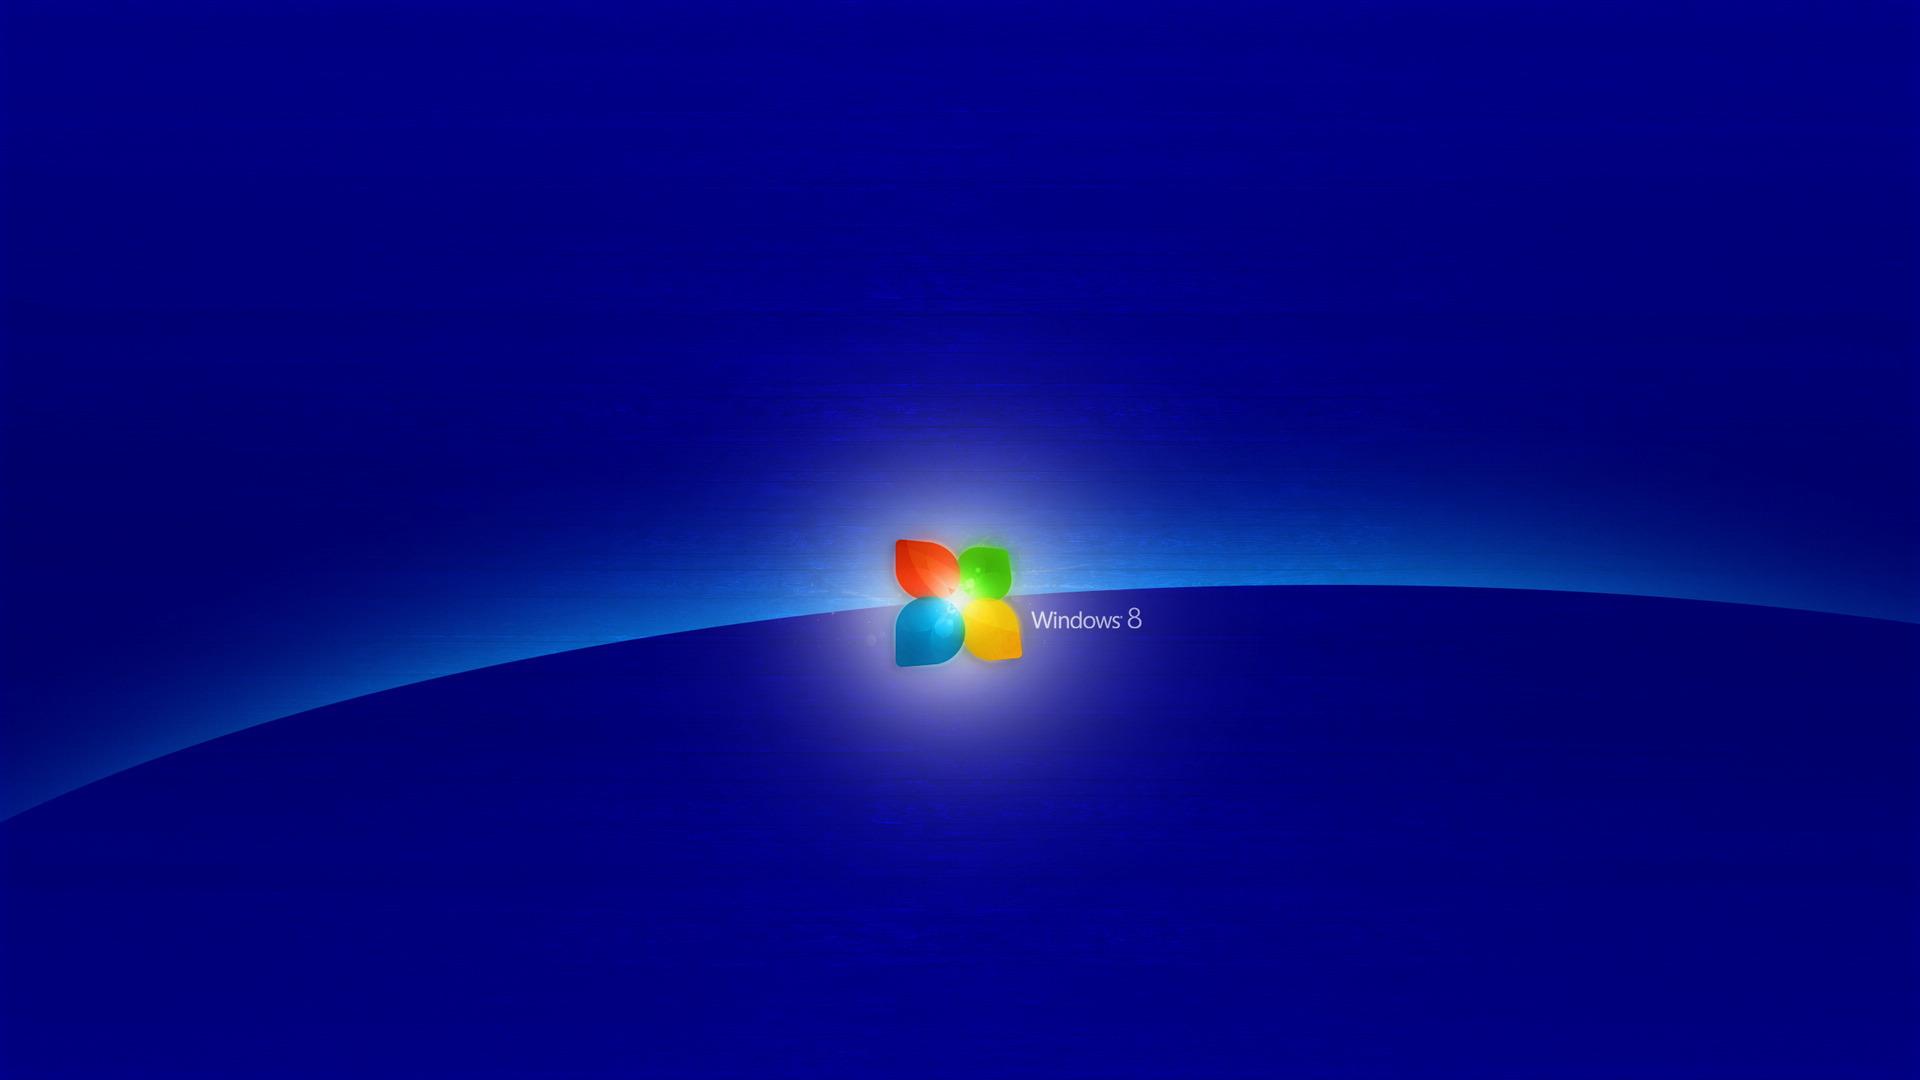 Windows Wallpaper Blue - WallpaperSafari